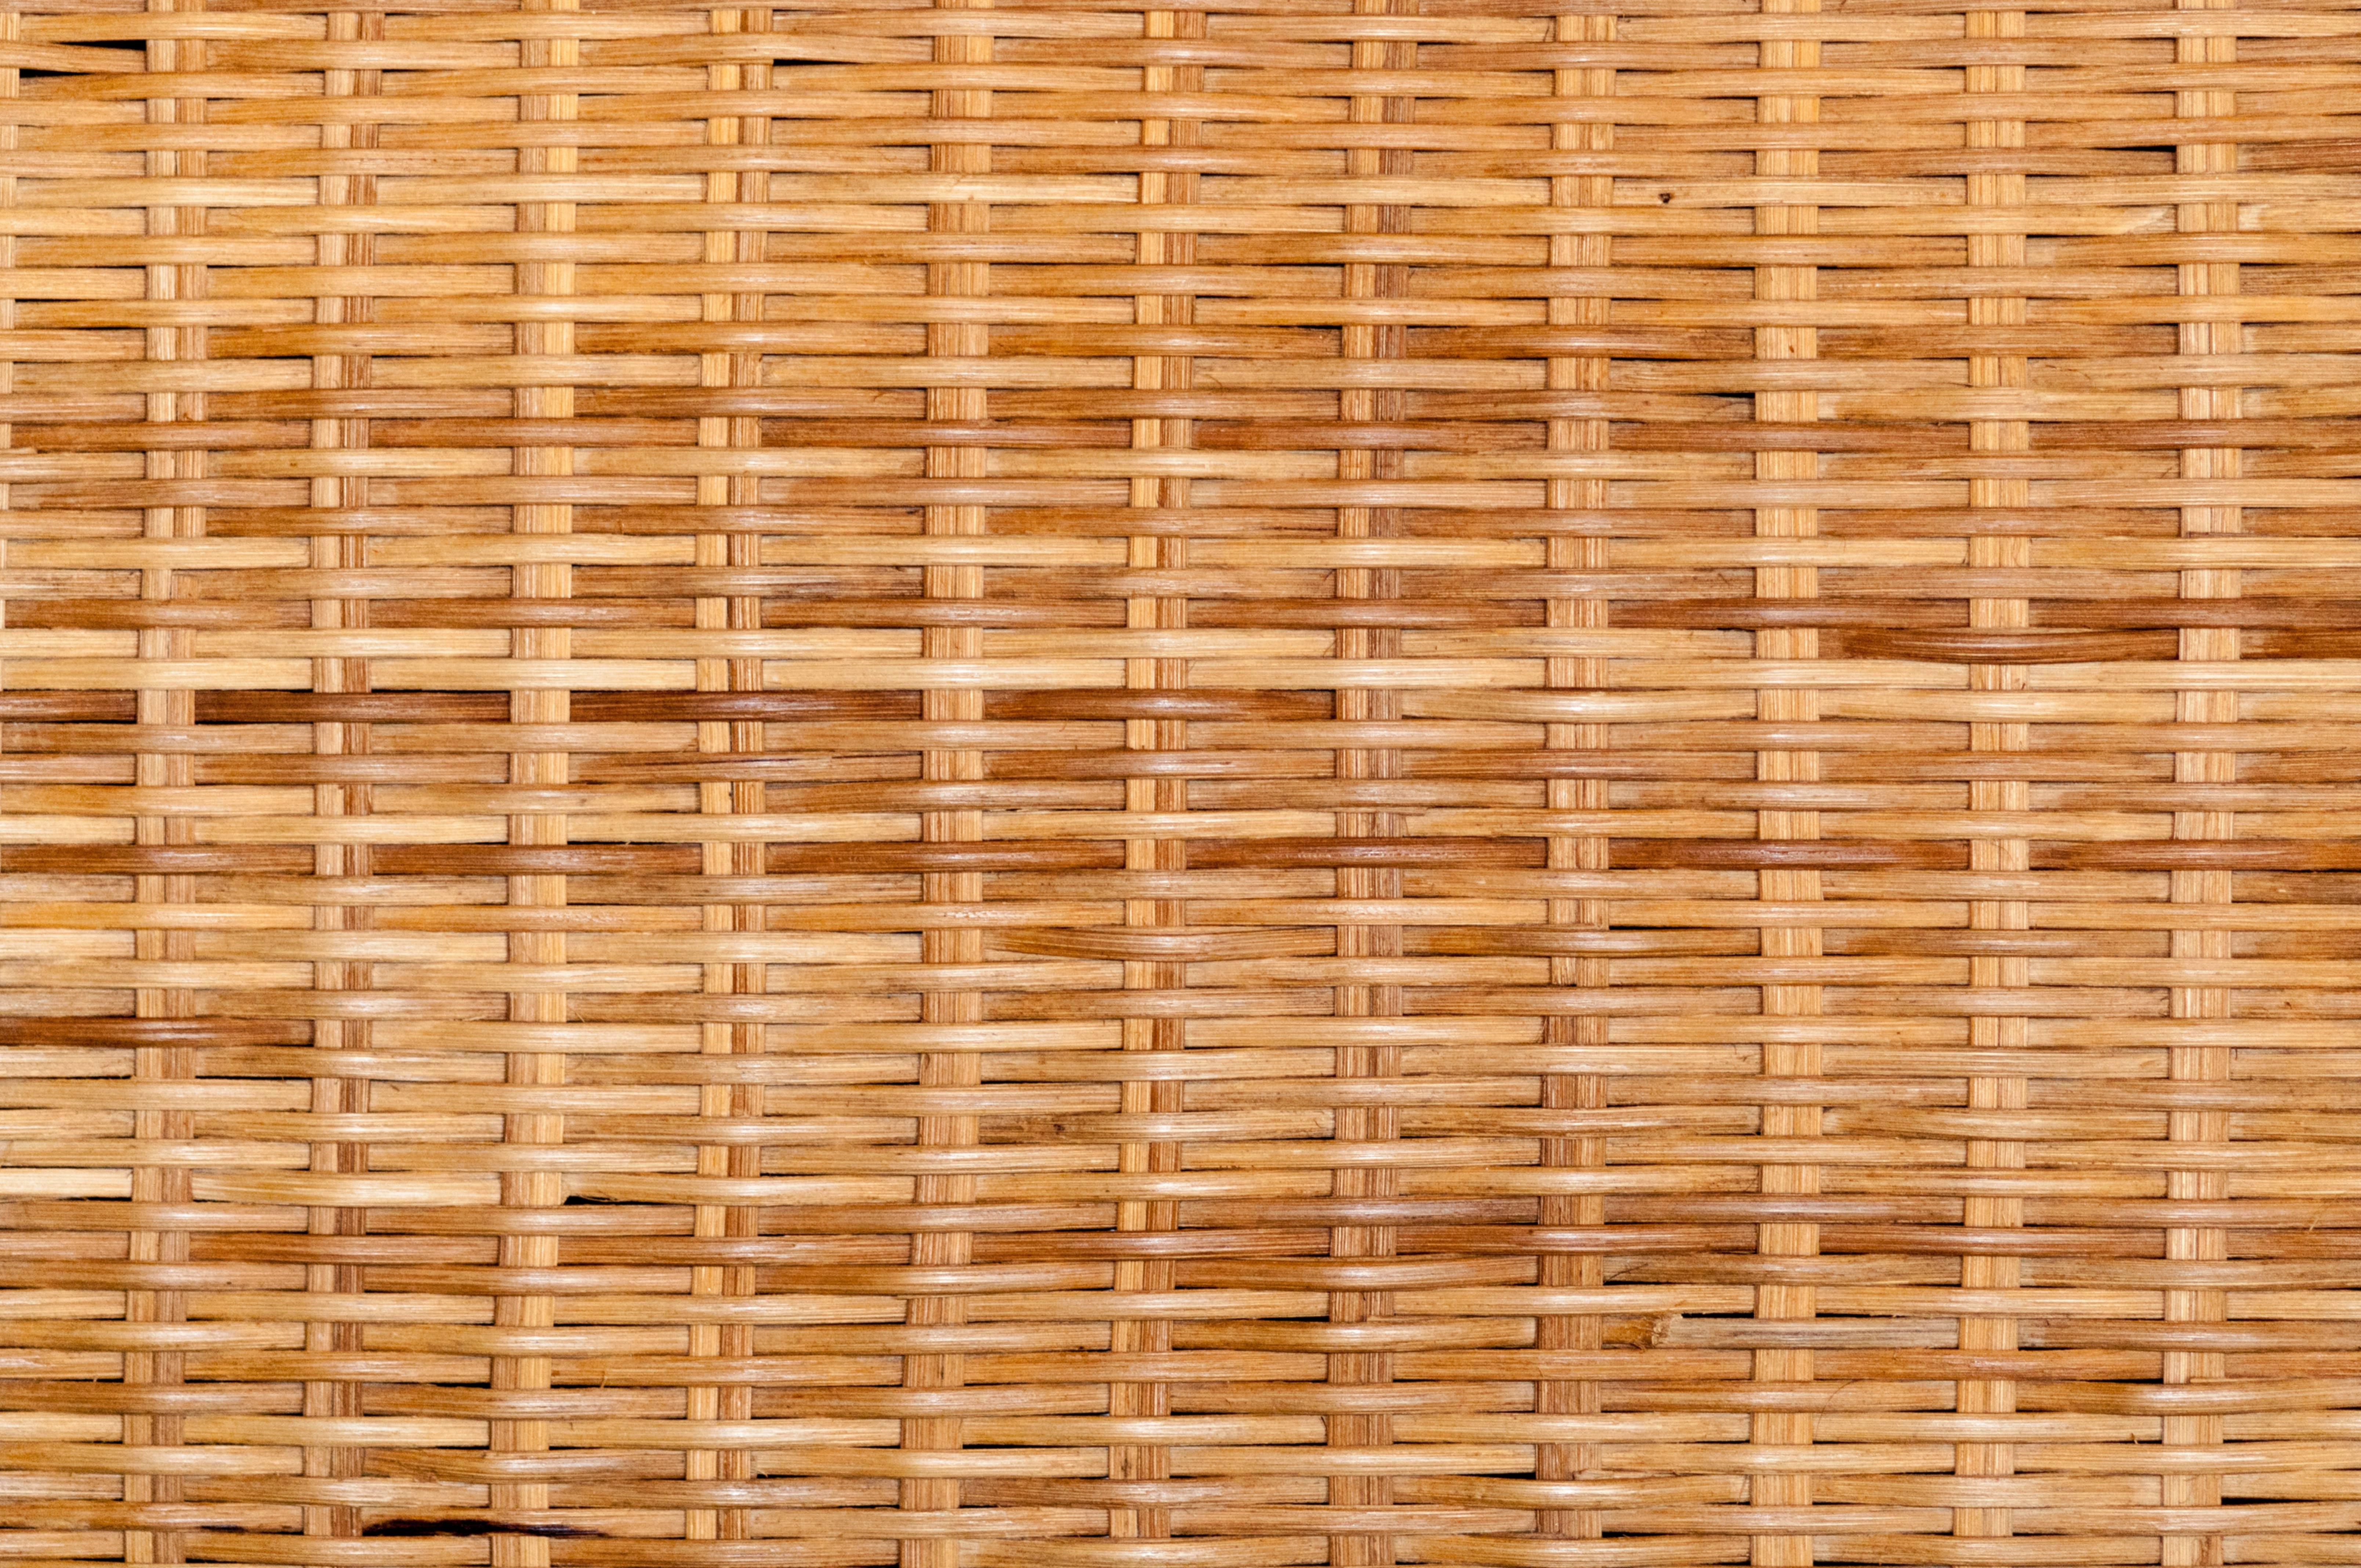 Woven Wood Texture Pattern